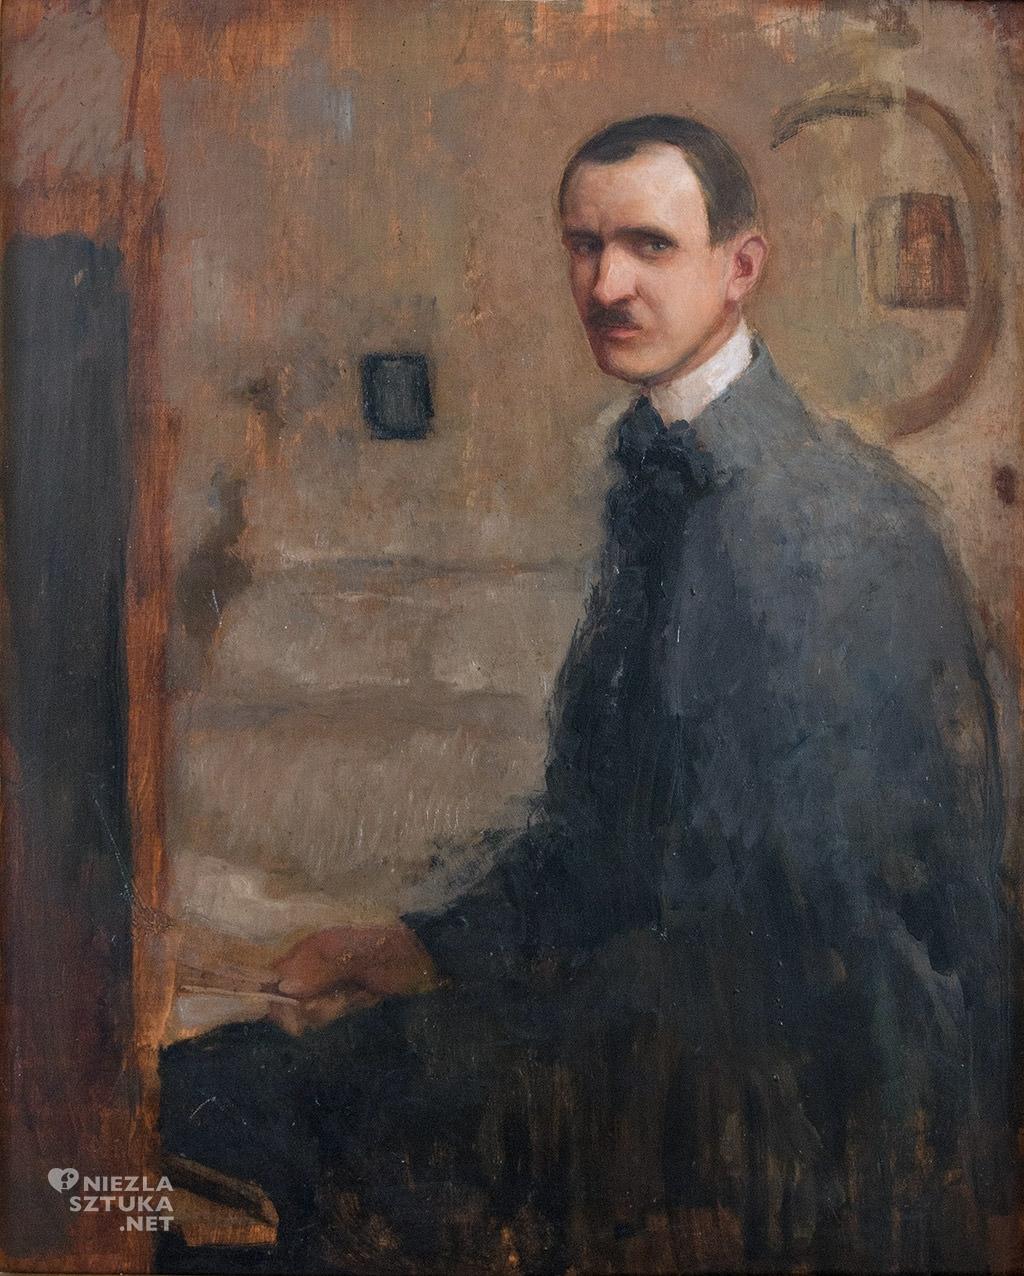 Alfons Karpiński Autoportret | 1907, fot. Barbara Szafrańska, kolekcja Krzysztofa Musiała